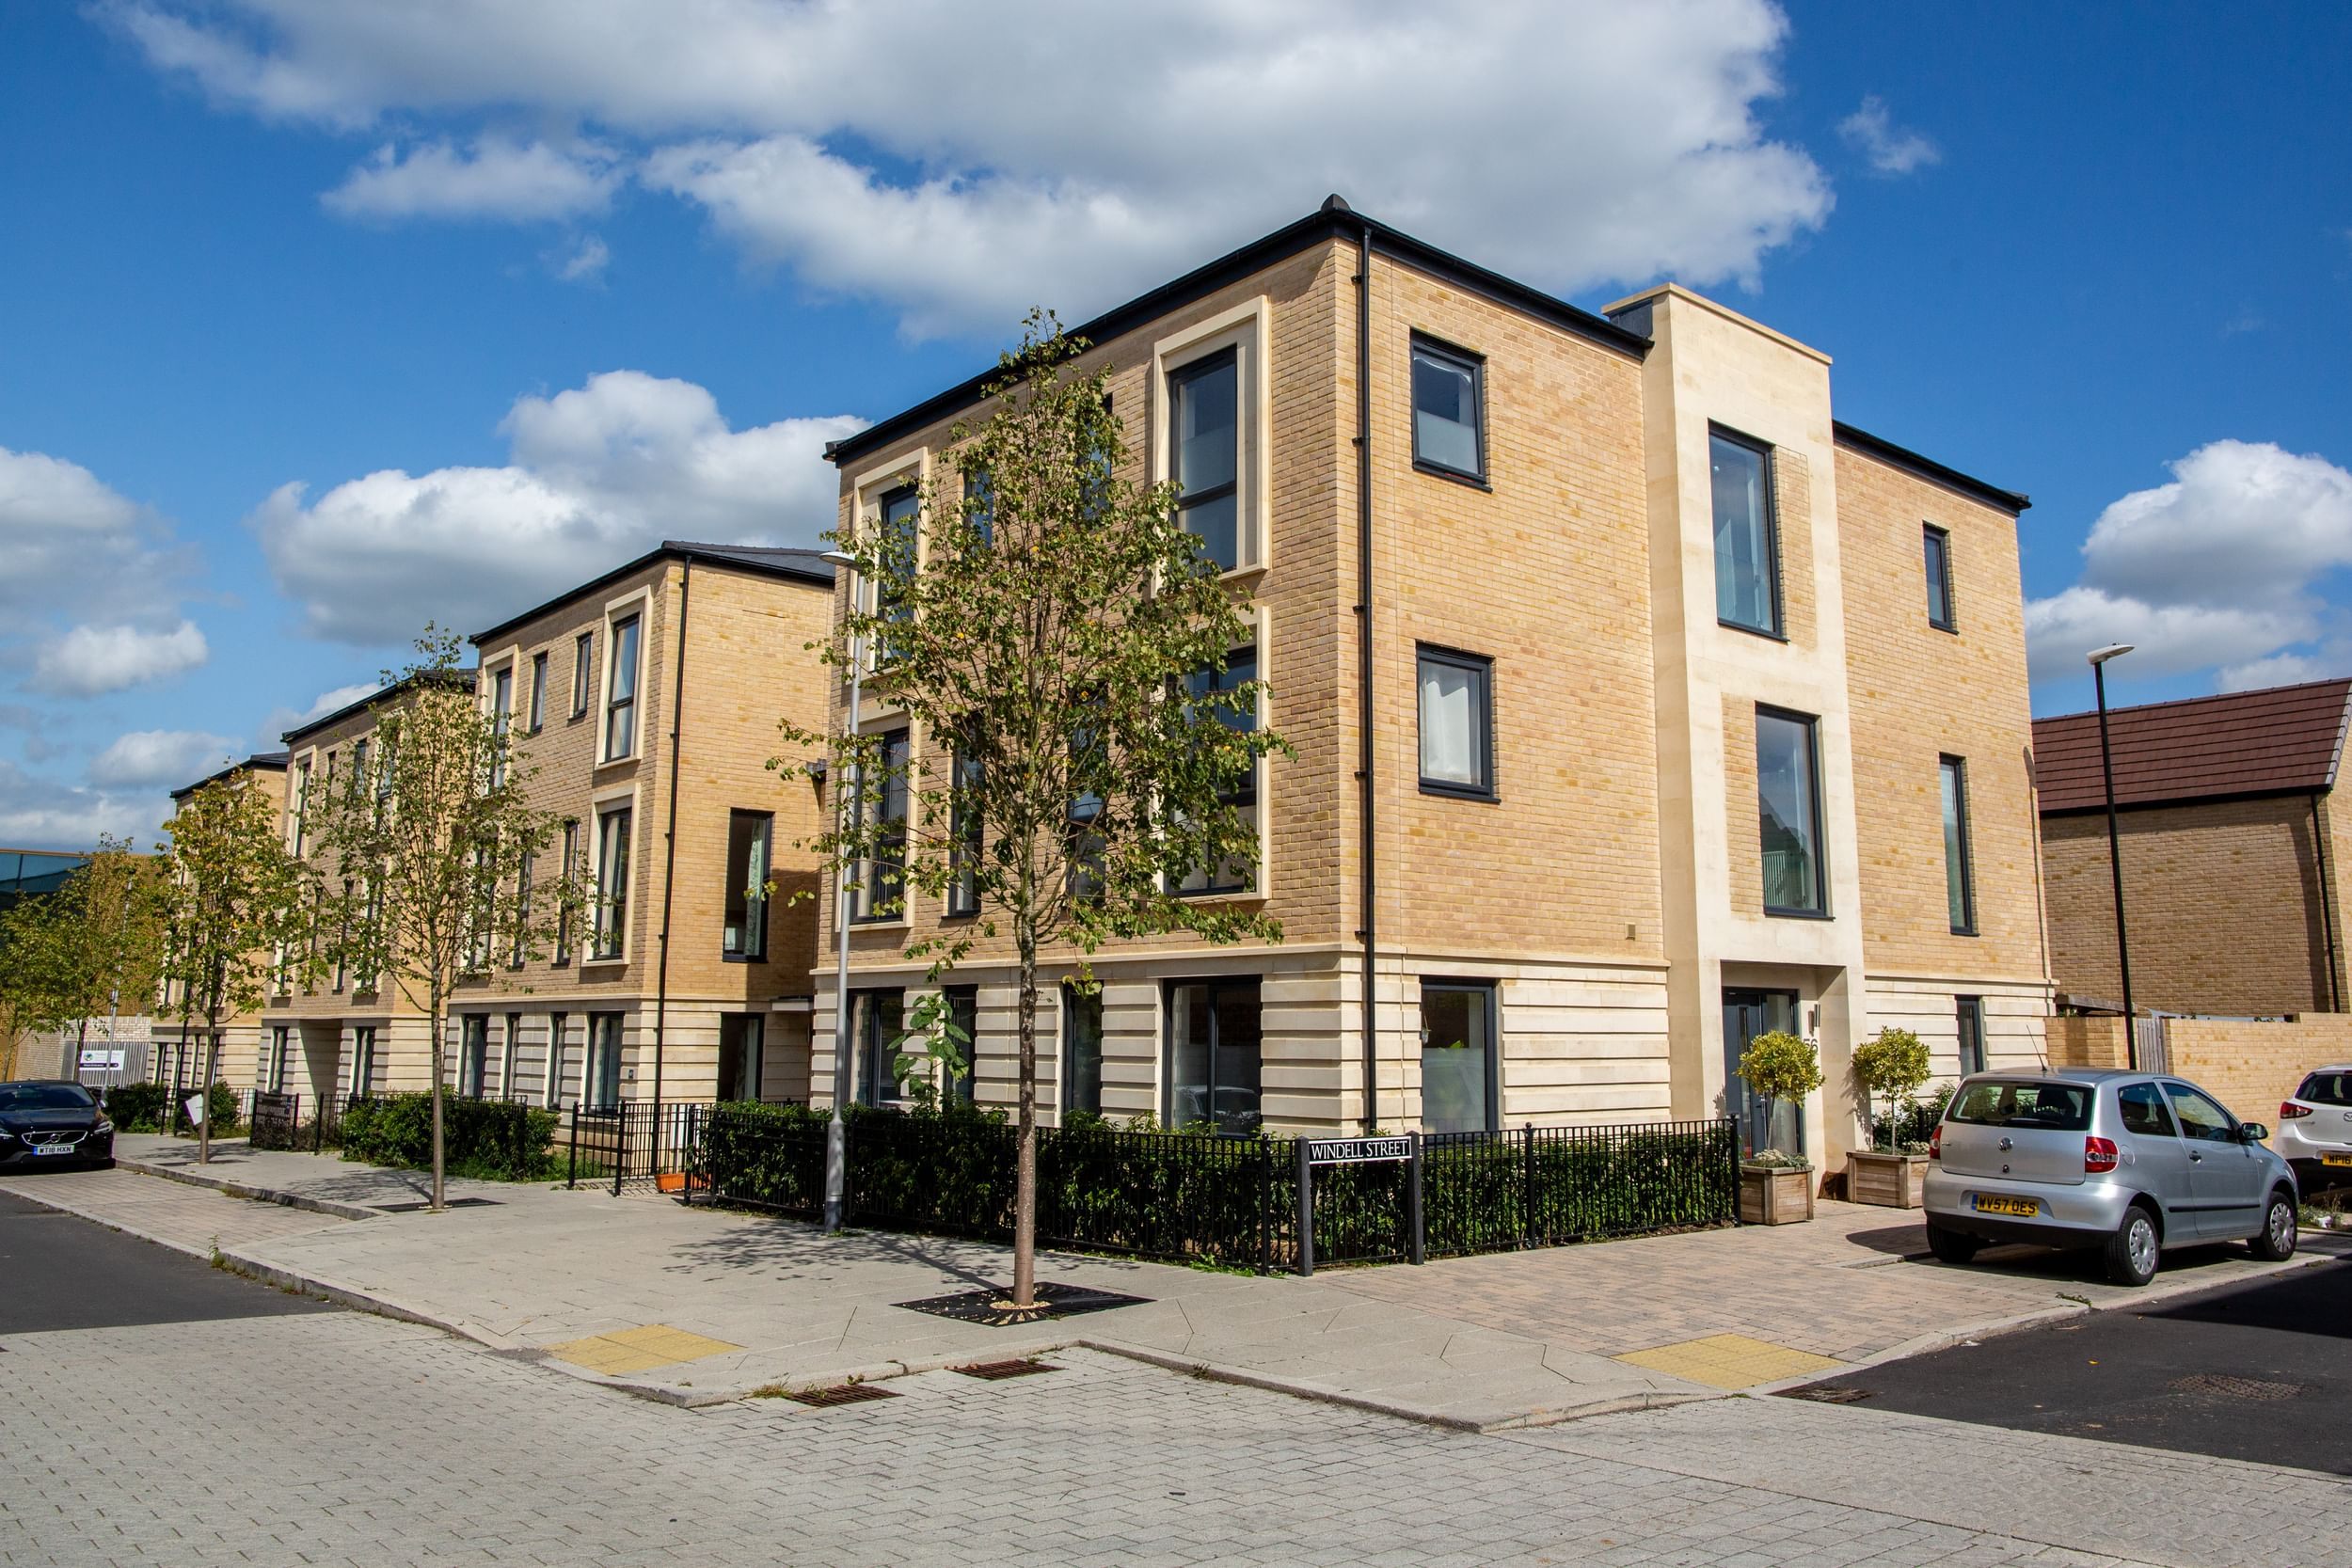 Housing development in Bath